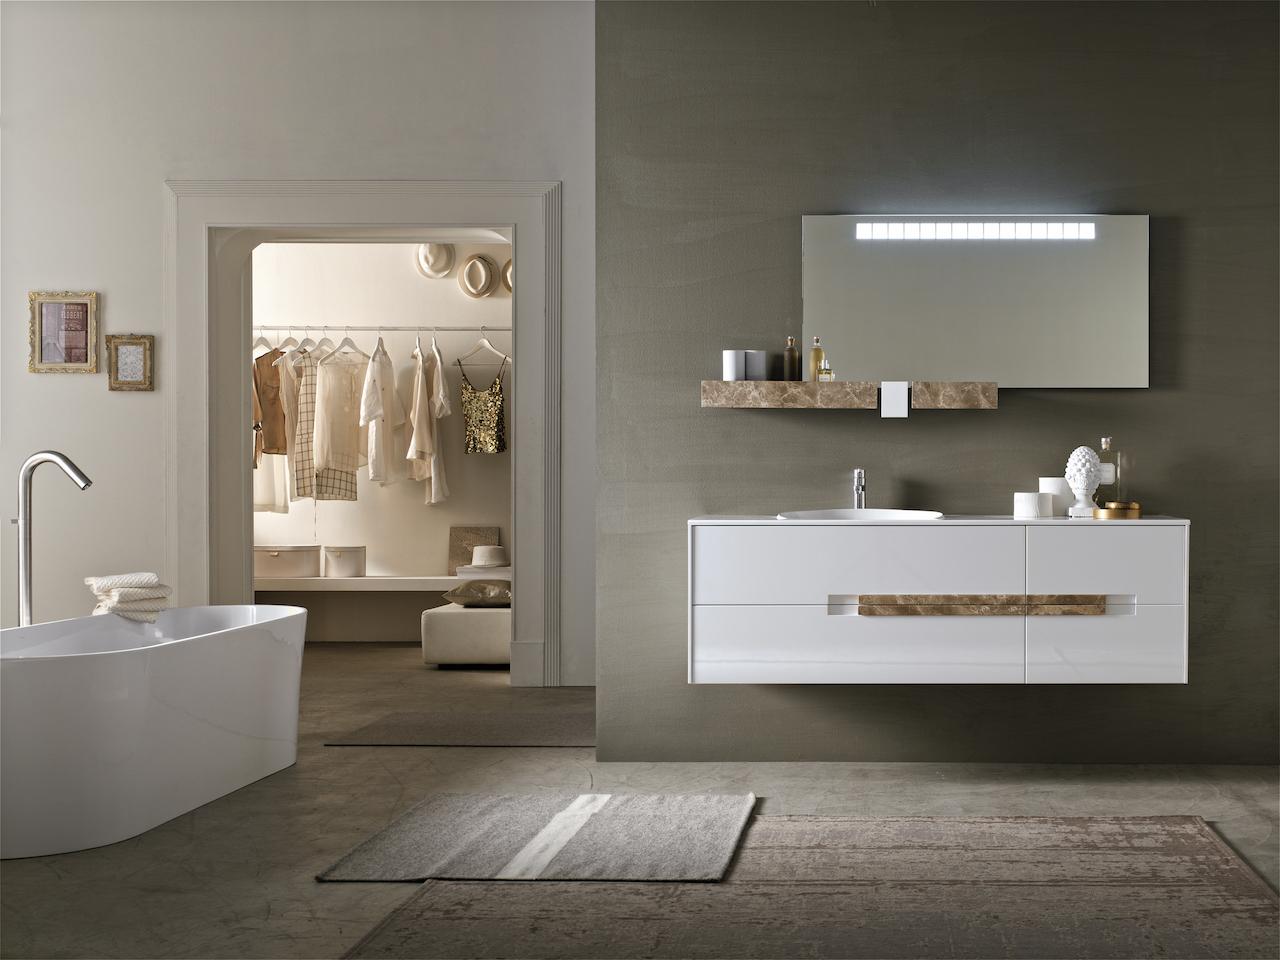 Nuovi stili per l arredo bagno for Artesi arredo bagno